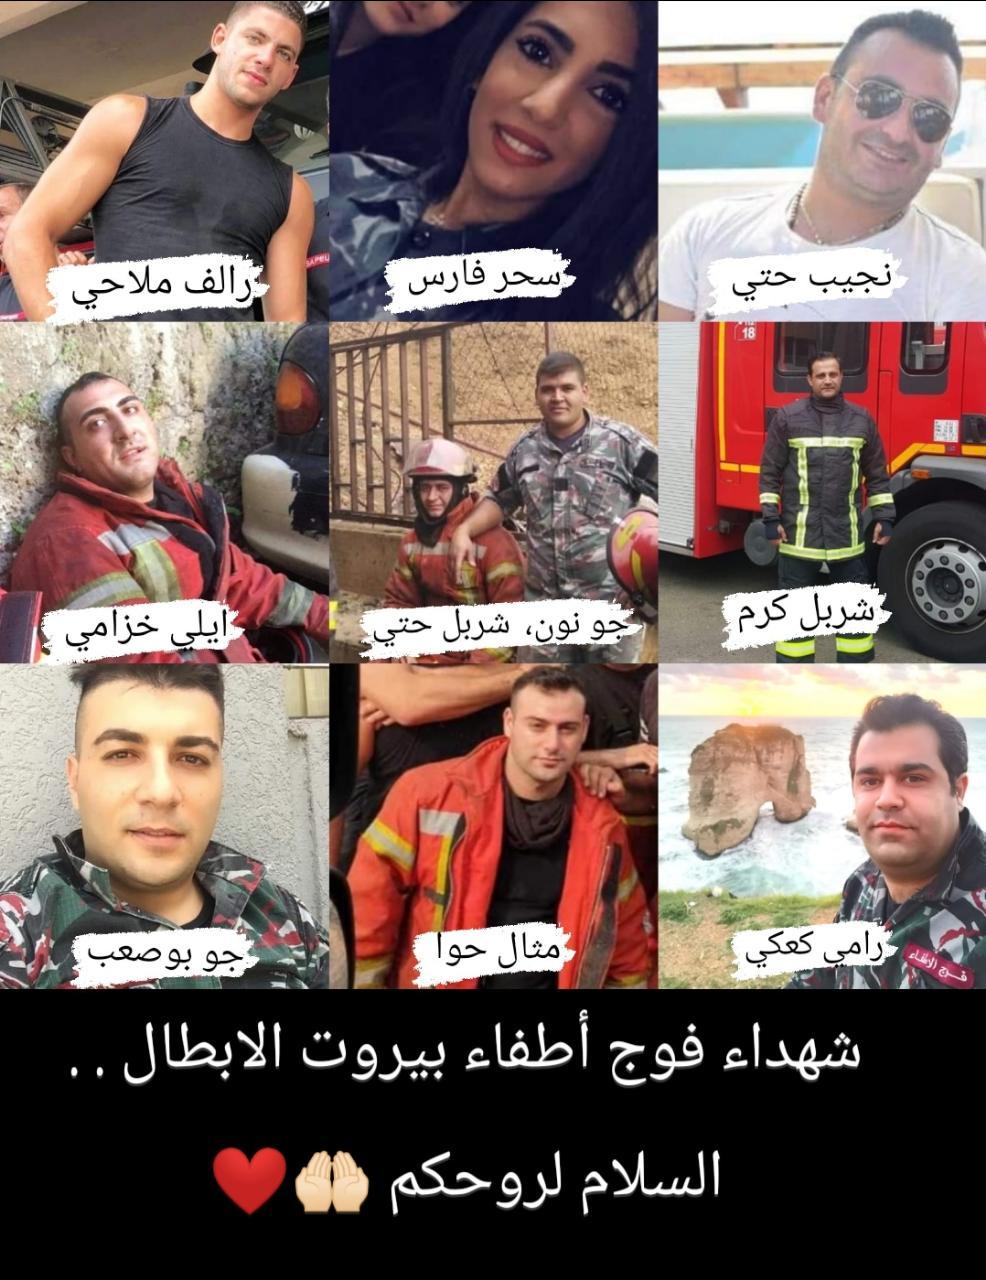 Bomberos del Líbano